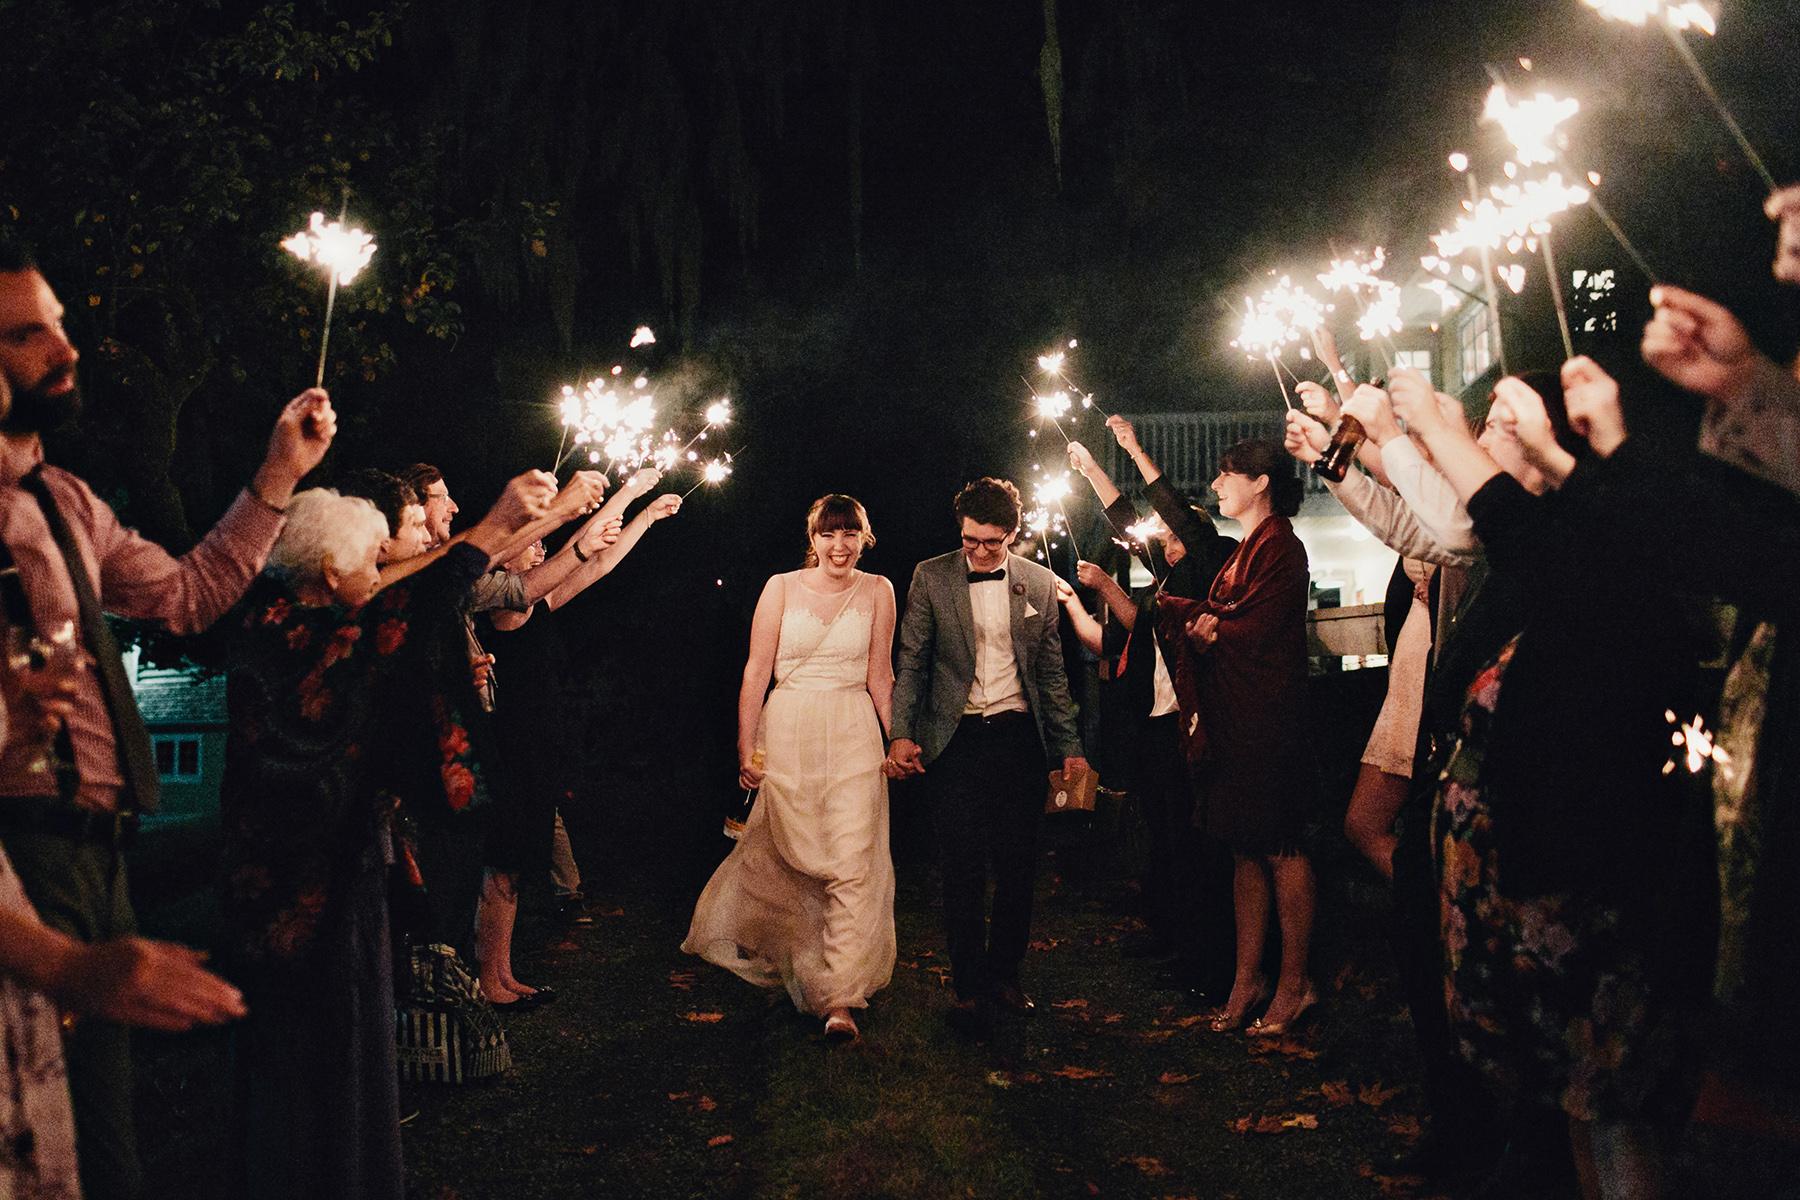 chelsea-brian-wedding-photos-0049.jpg